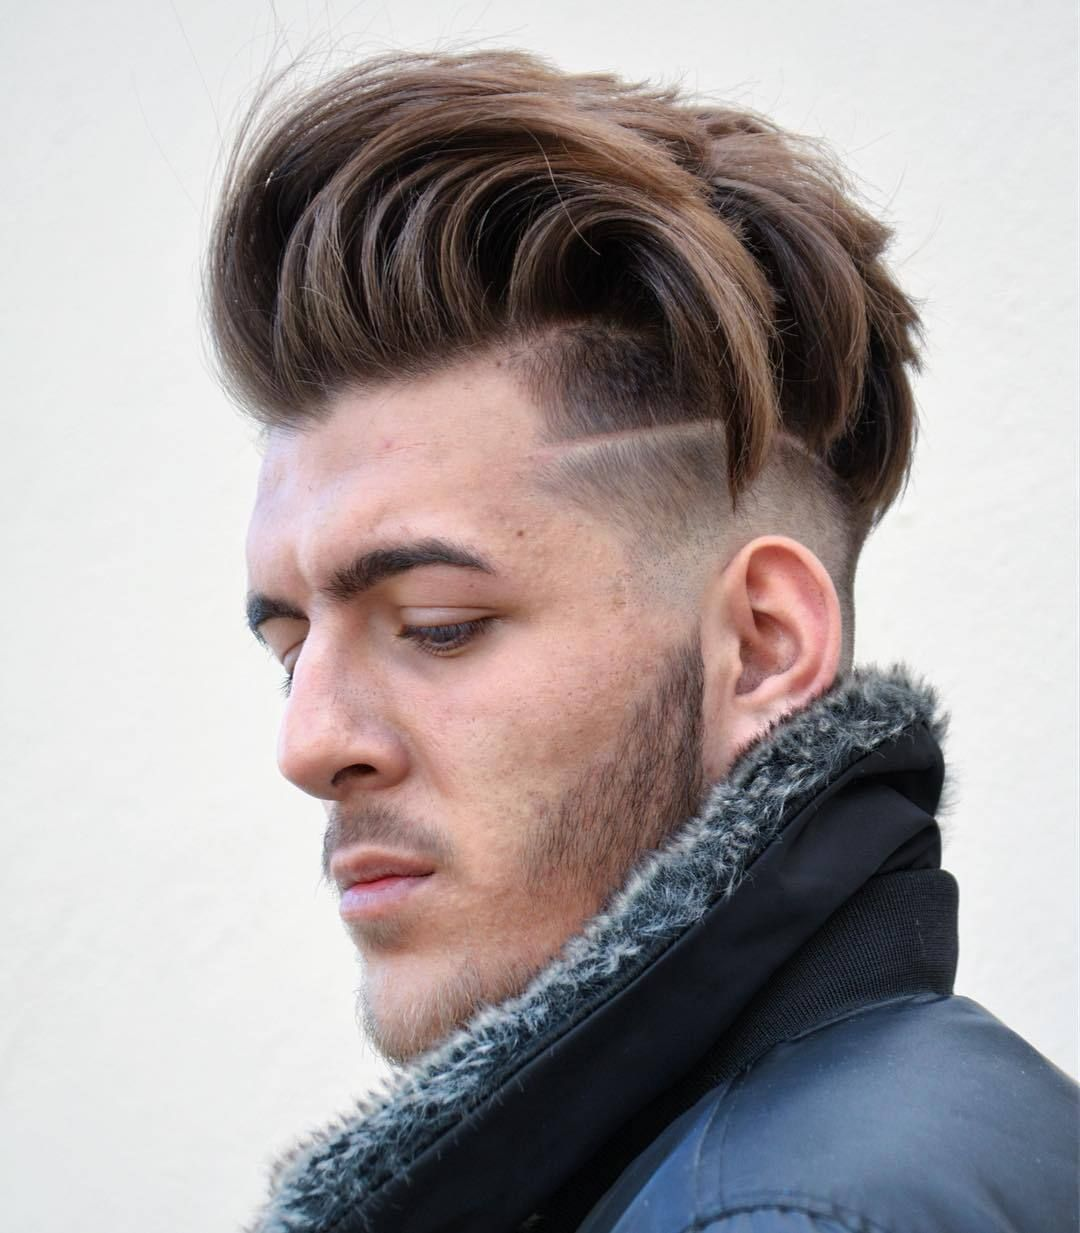 Mens haircuts for thick hair 2018